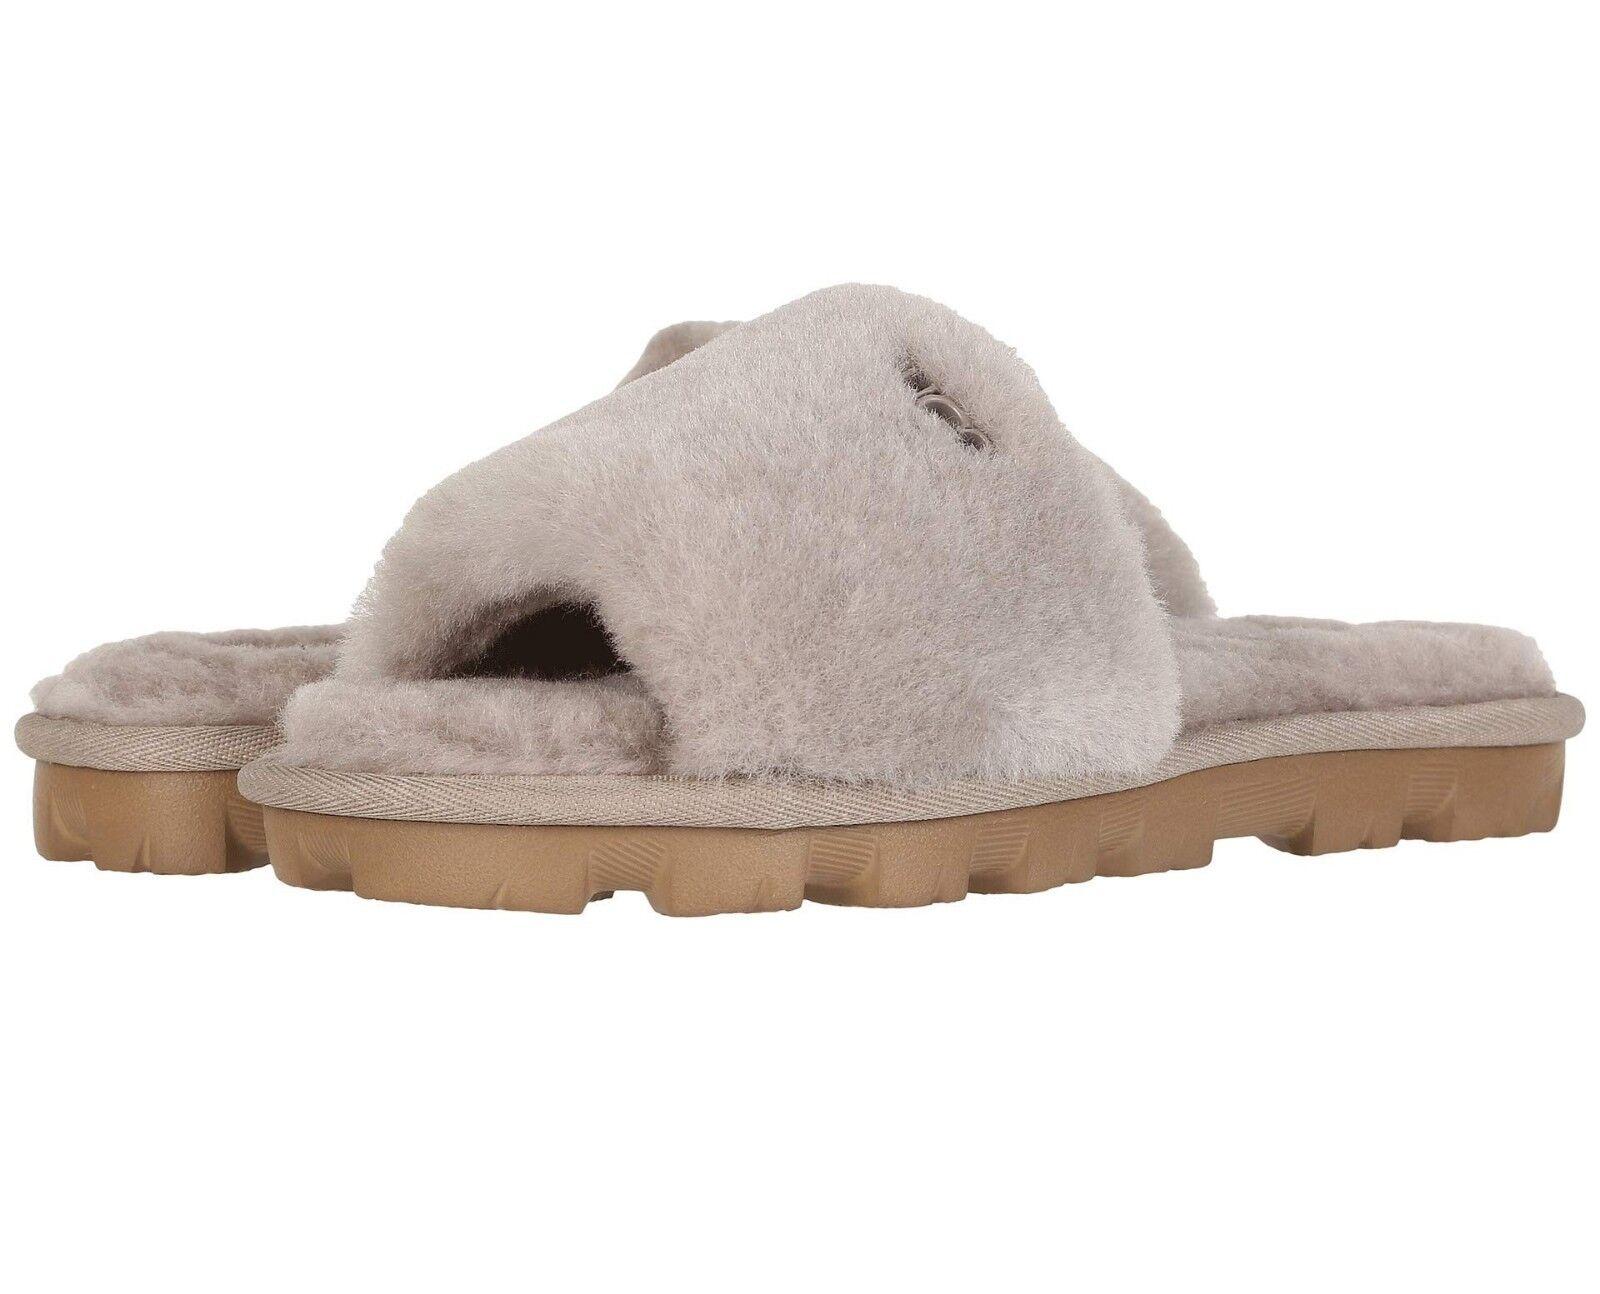 a68733ddd UGG Women's Cozette UGGpure Sheepskin Slides Oyster Gray Size 7 for ...